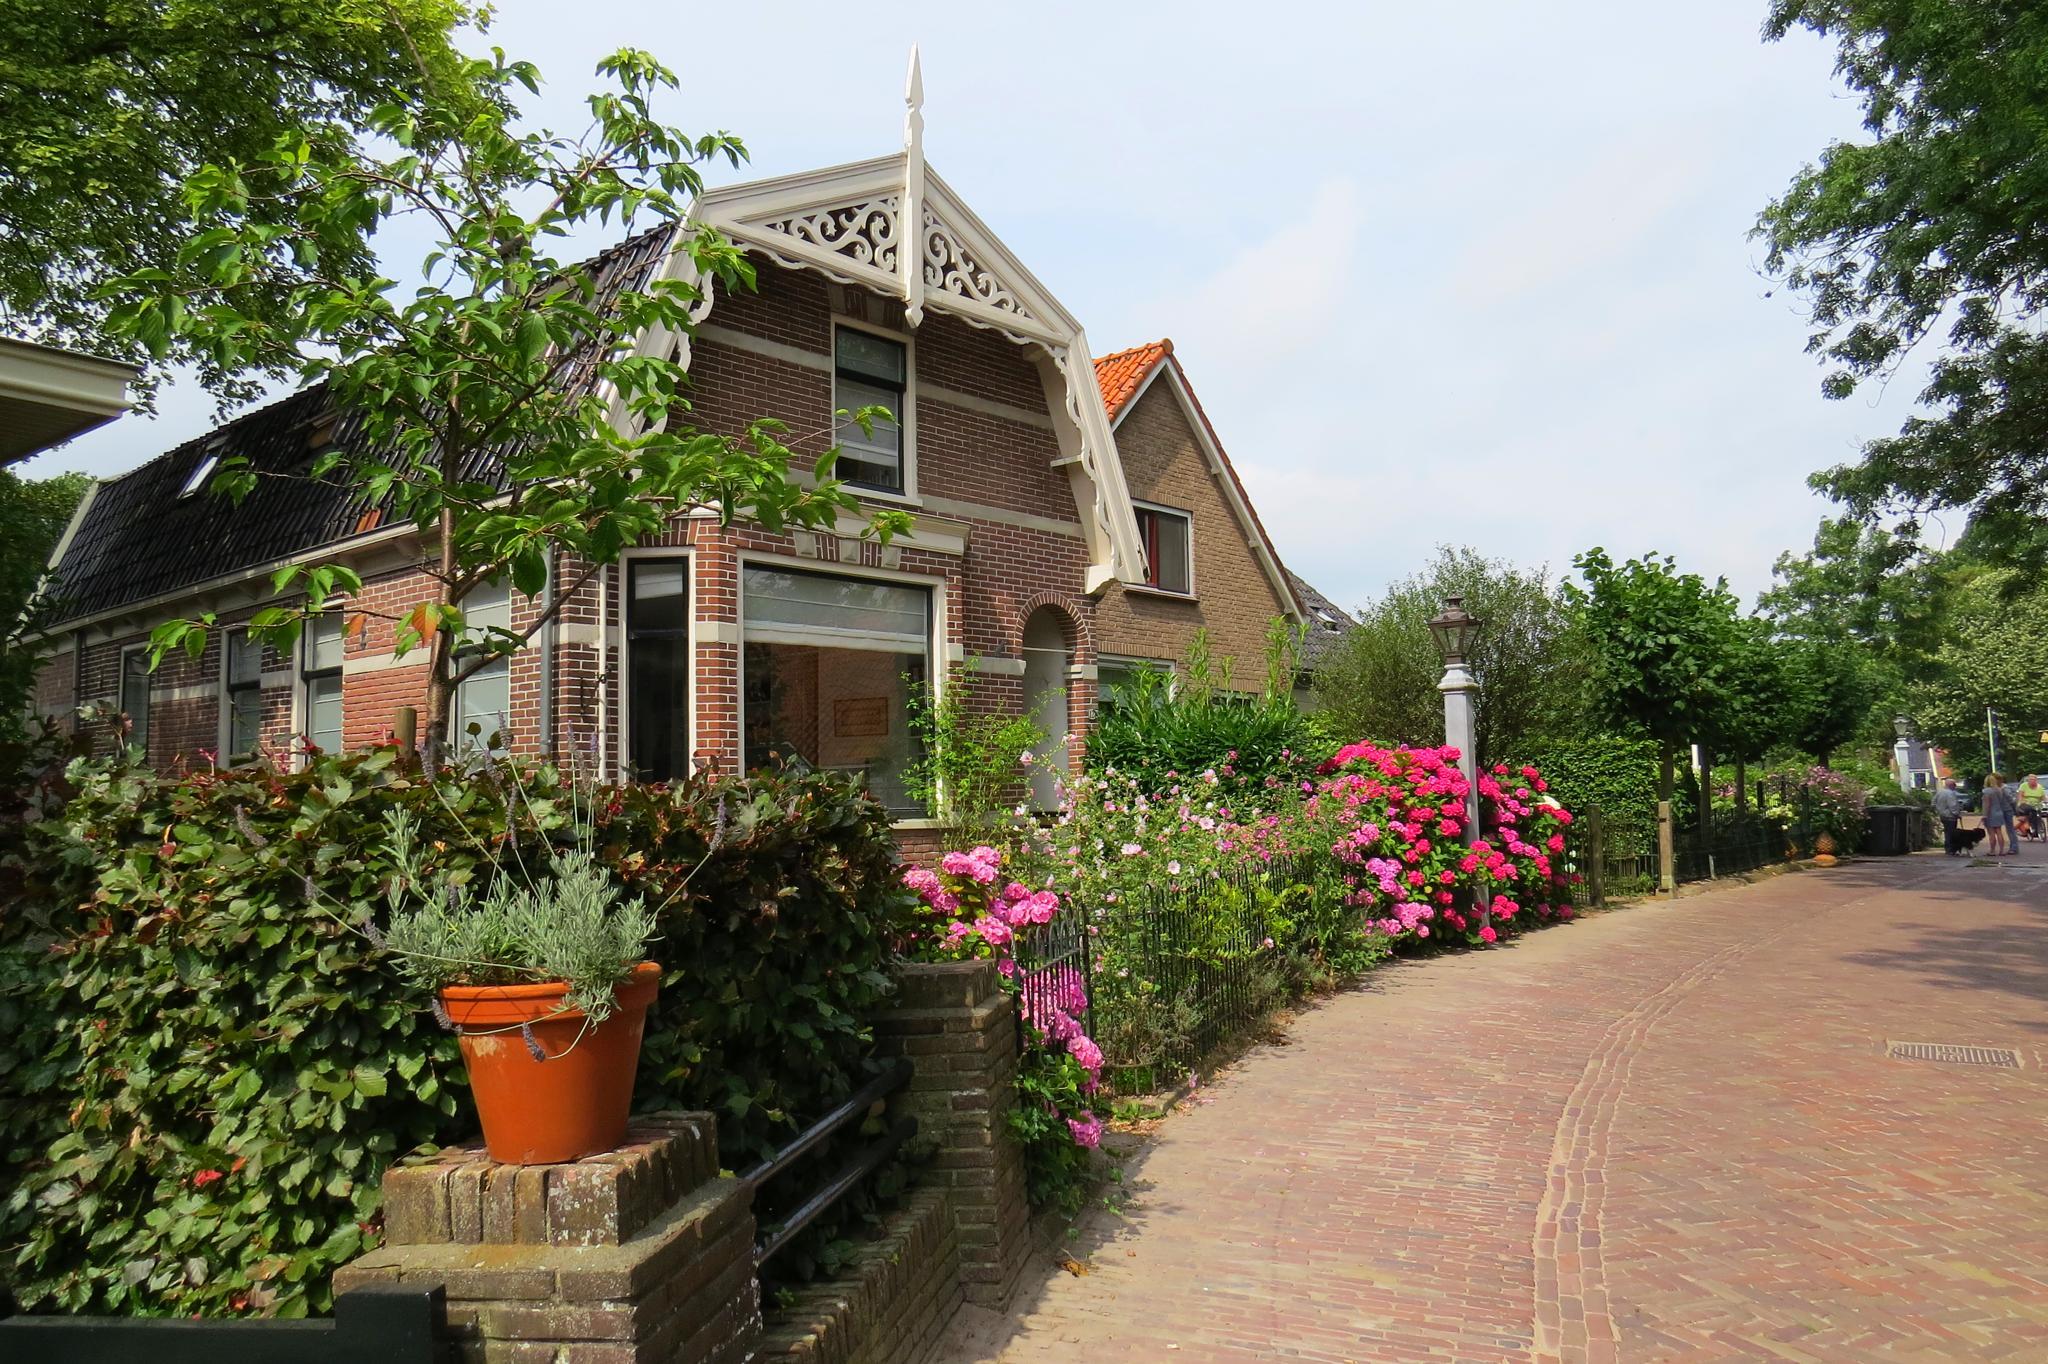 holandia miasteczka broek in waterland